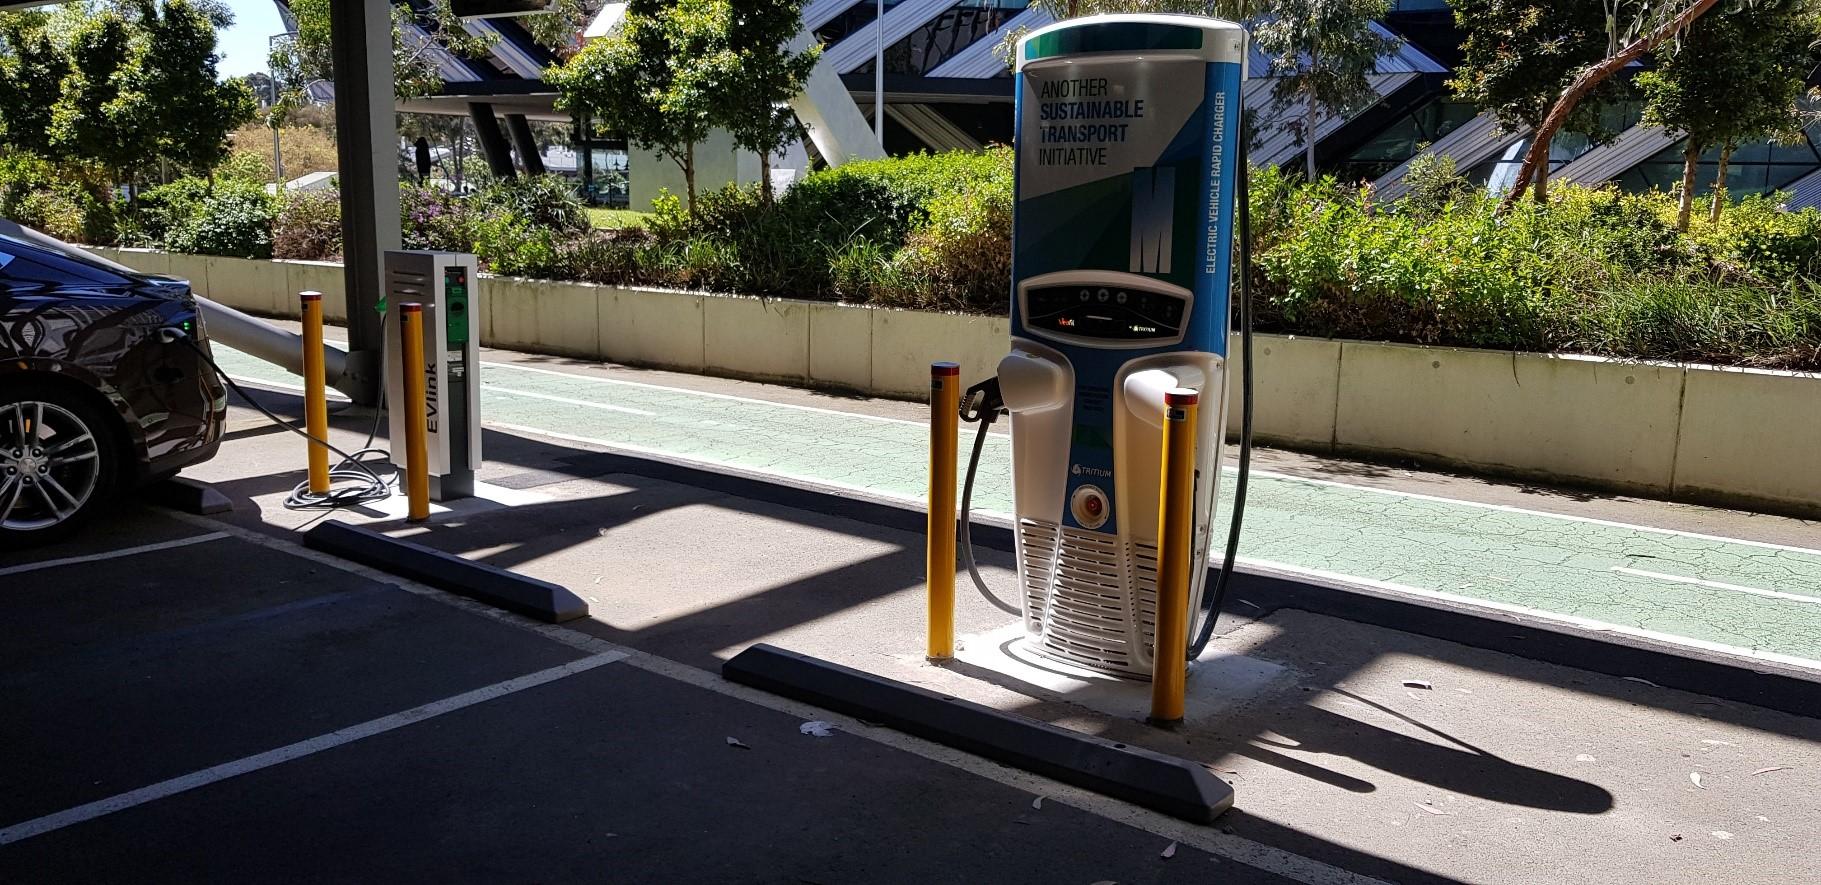 Public Charging station at Monash University (JET Charge installed)